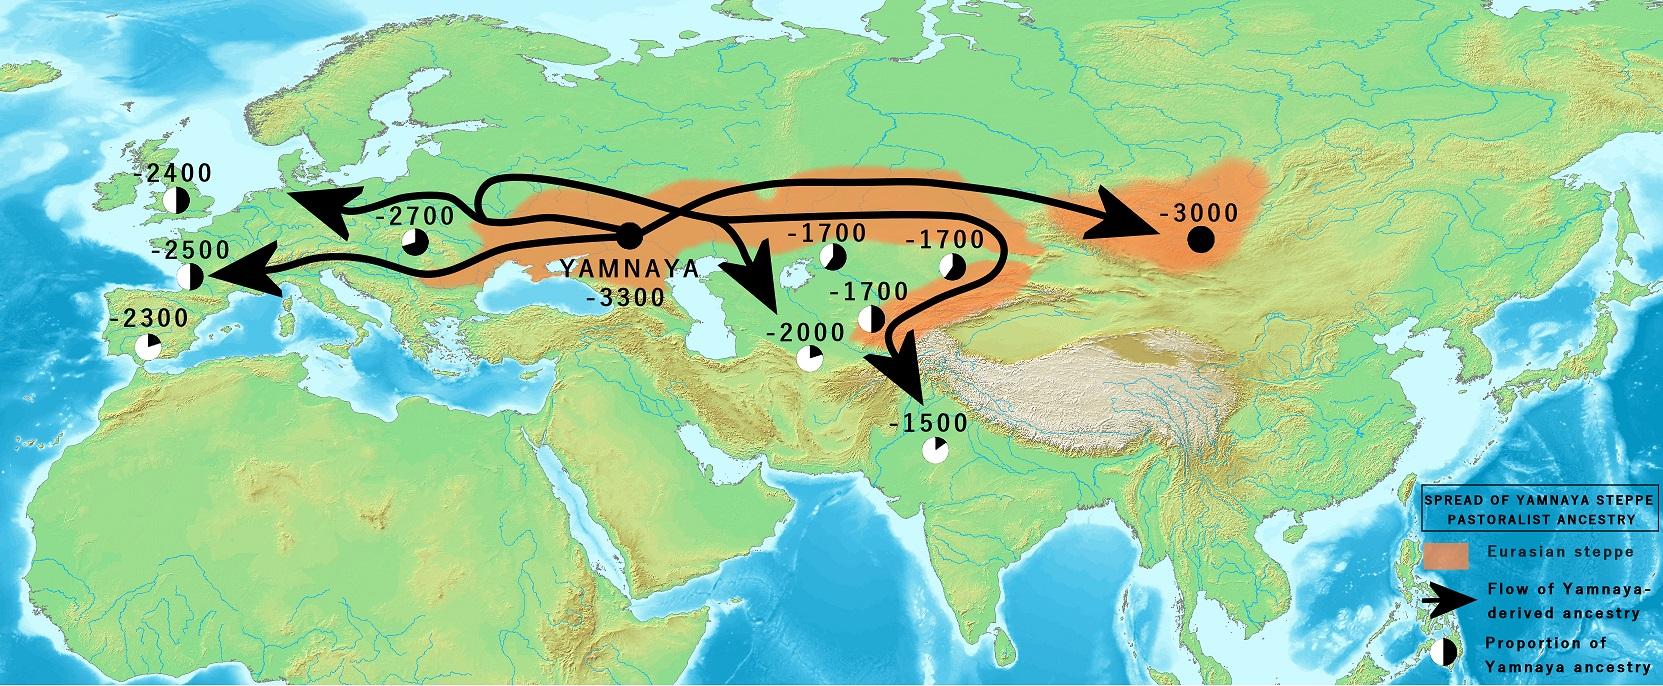 Vedic Period - Yamnaya Steppe Pastoralists